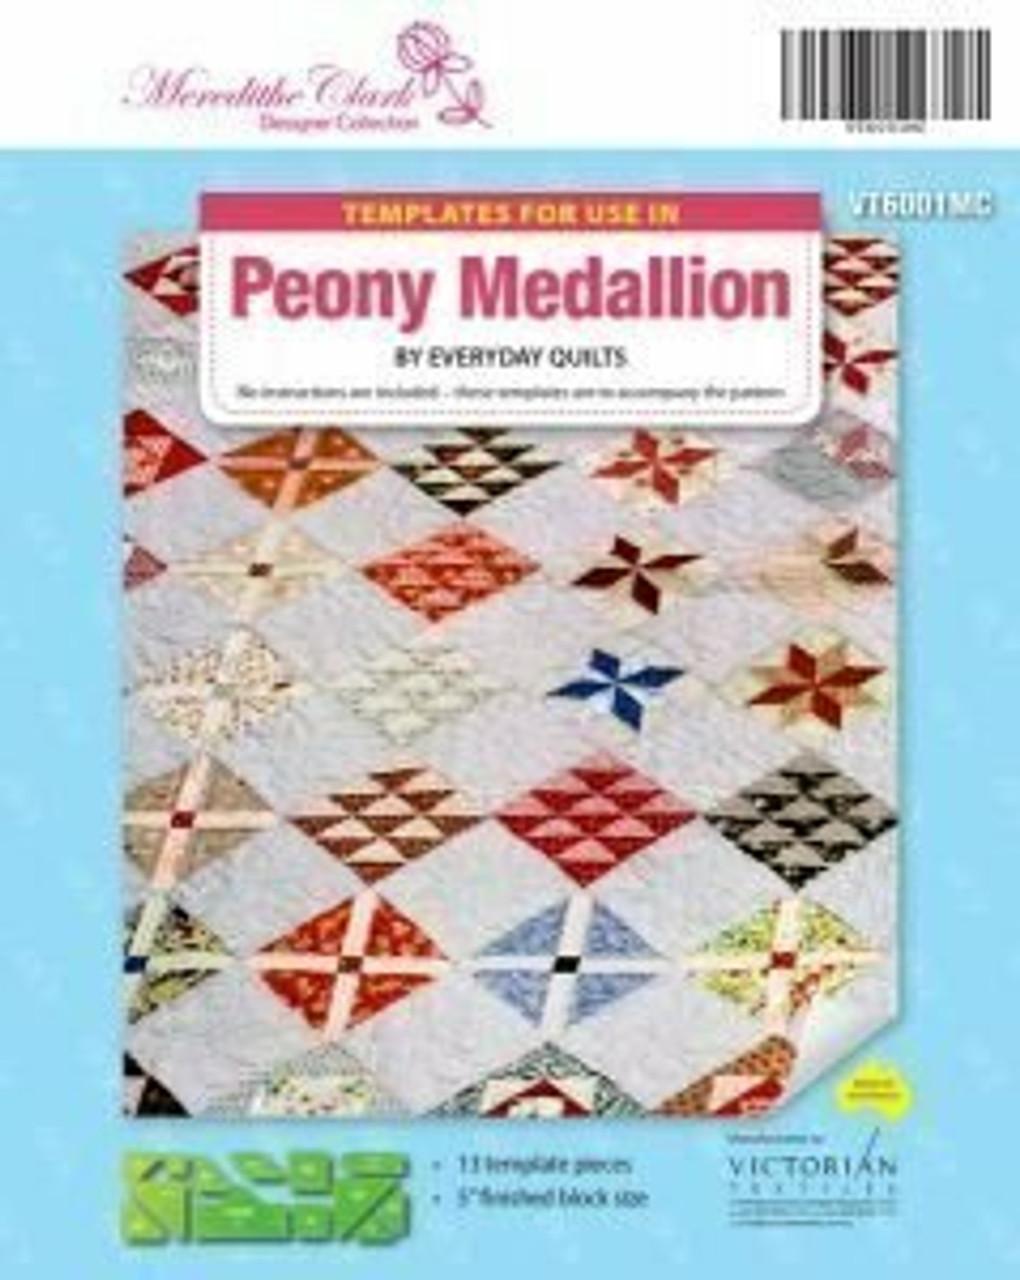 Meredithe Clark Designer Collection - Peony Medallion templates